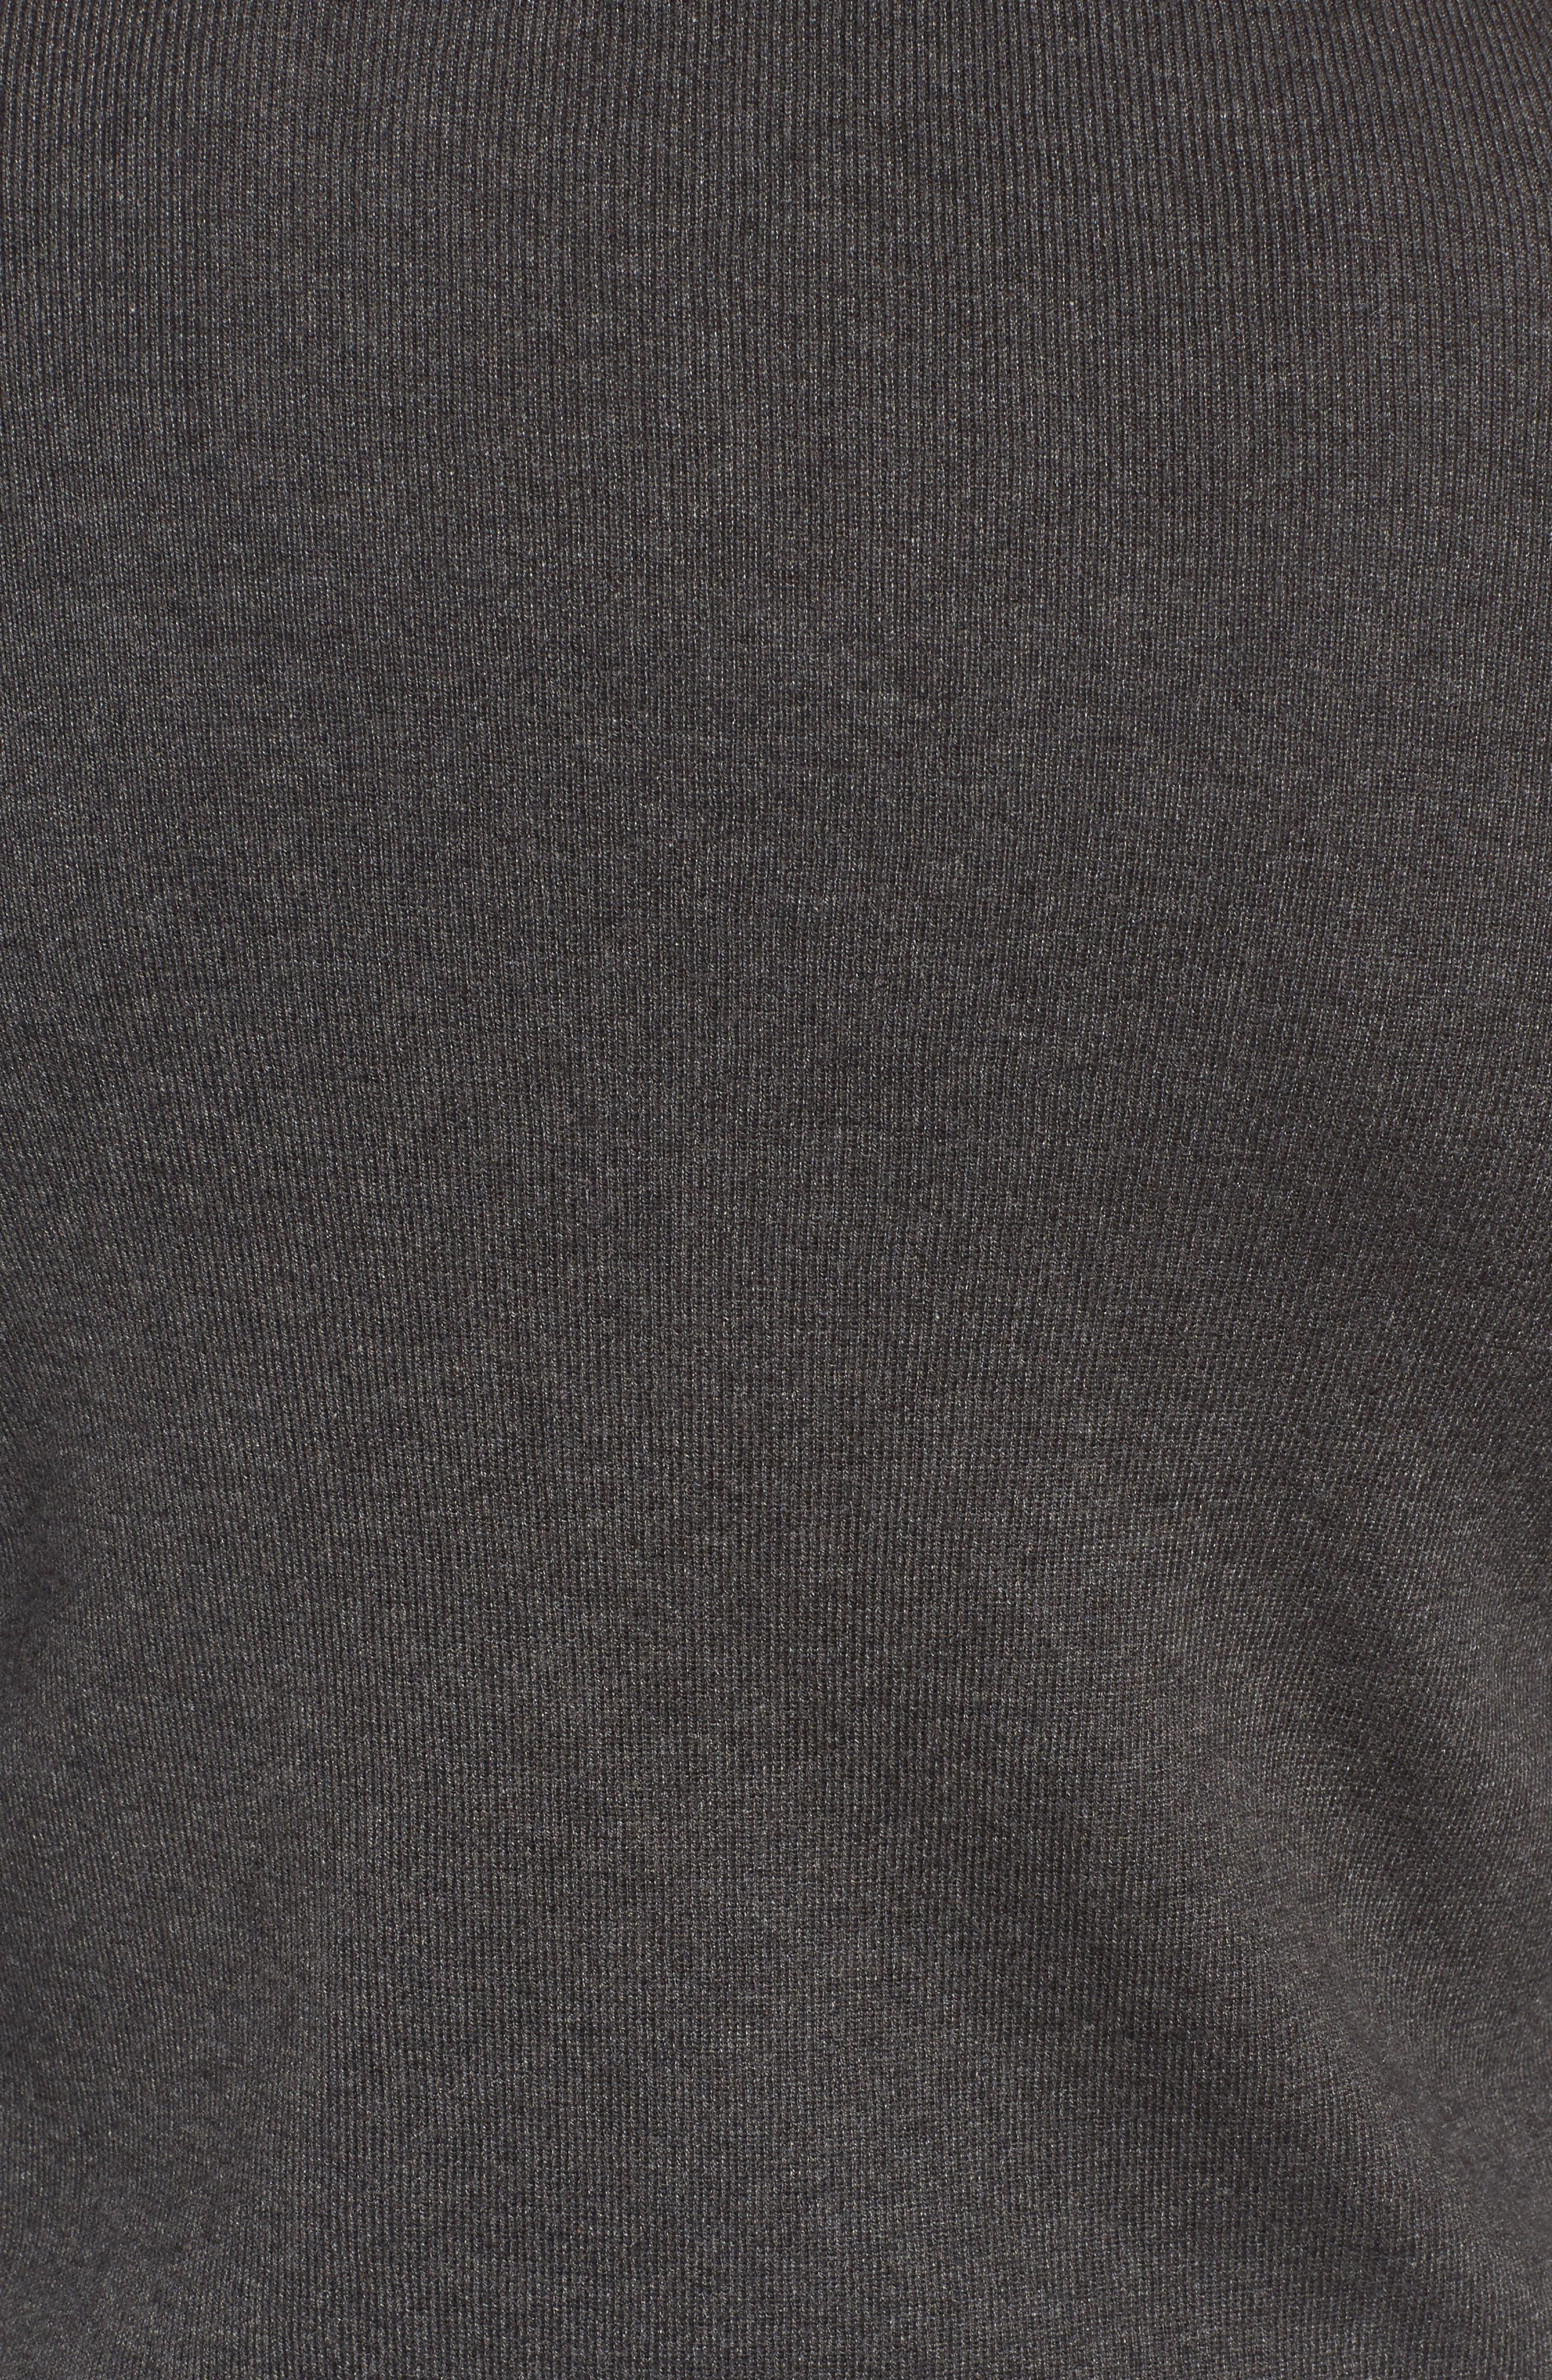 4-Way Convertible Lightweight Cardigan,                             Alternate thumbnail 339, color,